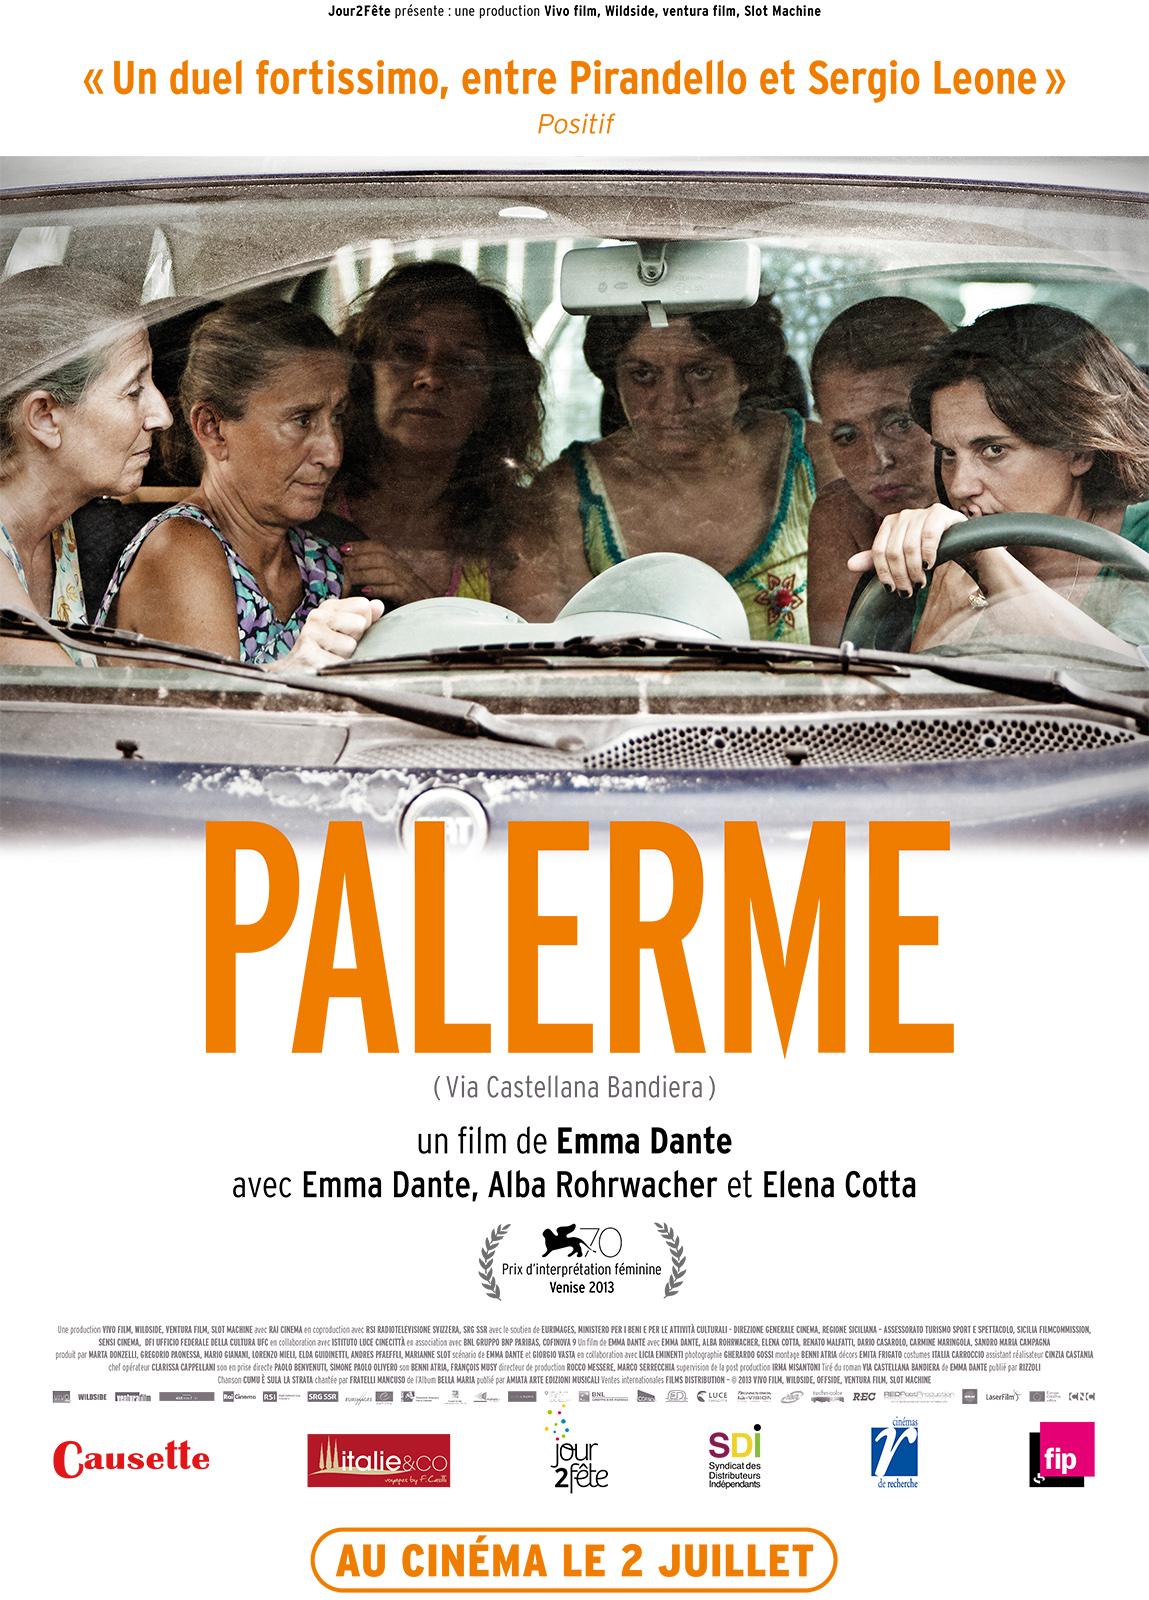 FILM EN STREAMING QUAND ON VOIT UNE FEMELLE A